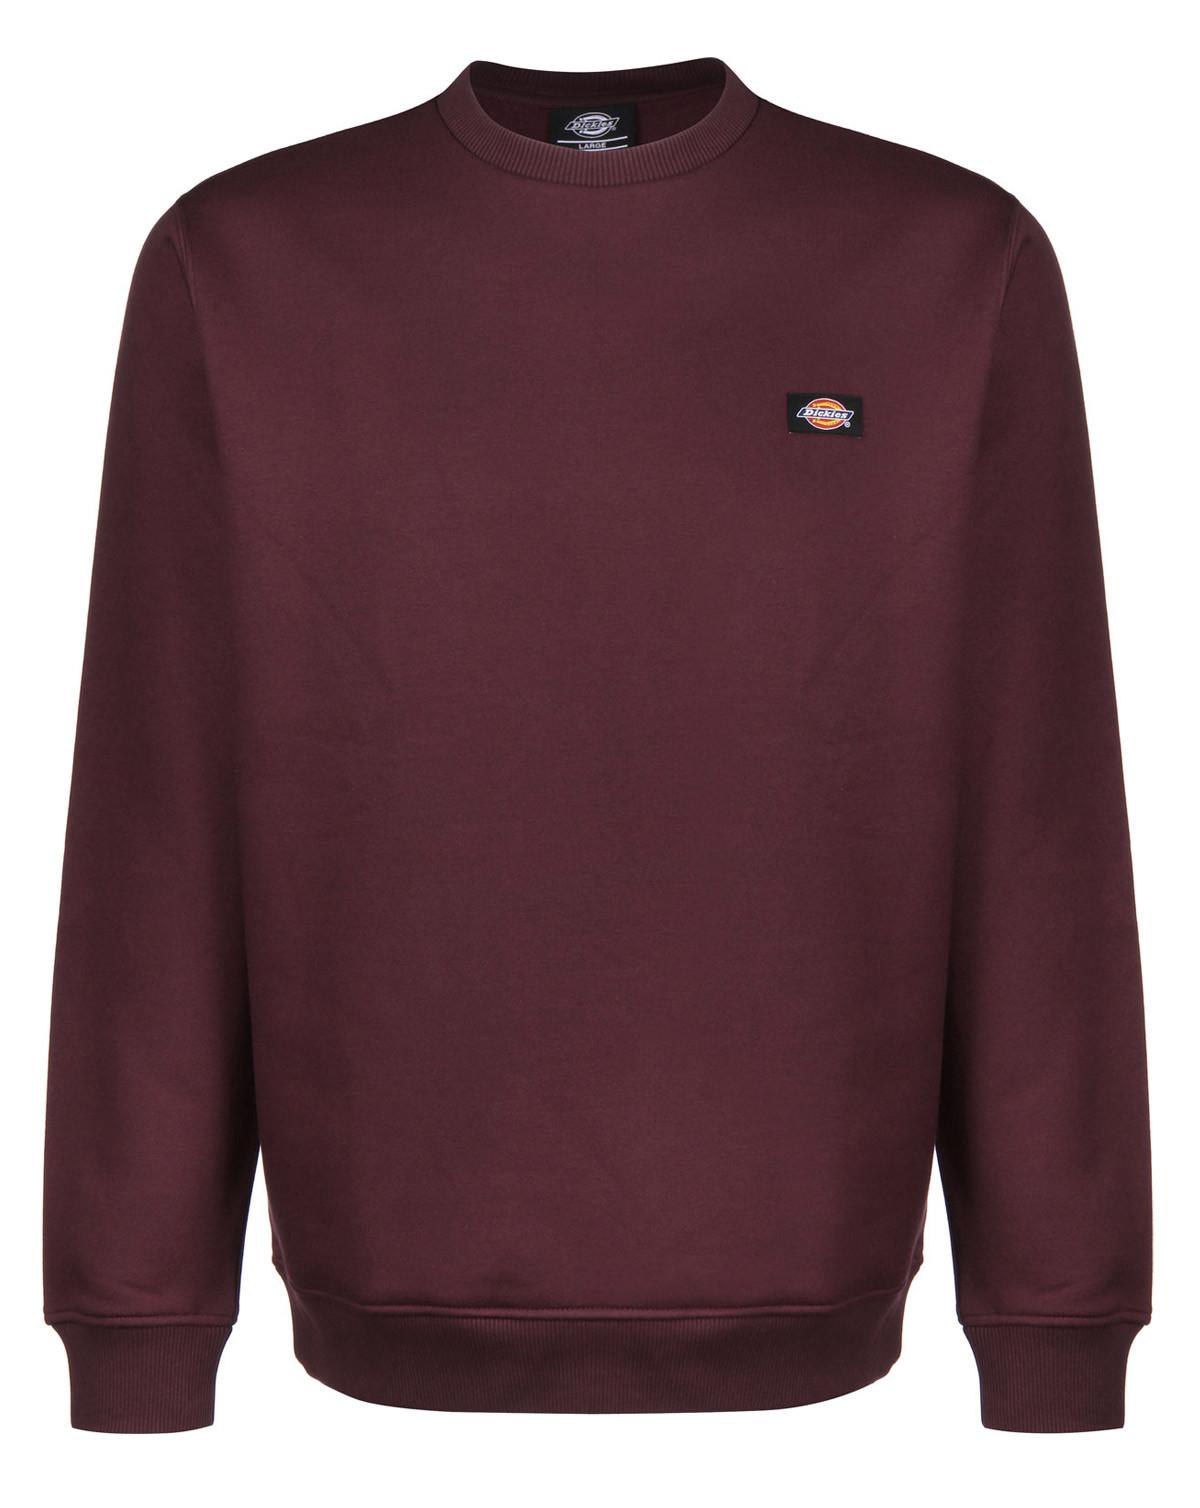 Dickies New Jersey Sweatshirt (Maroon, XS)